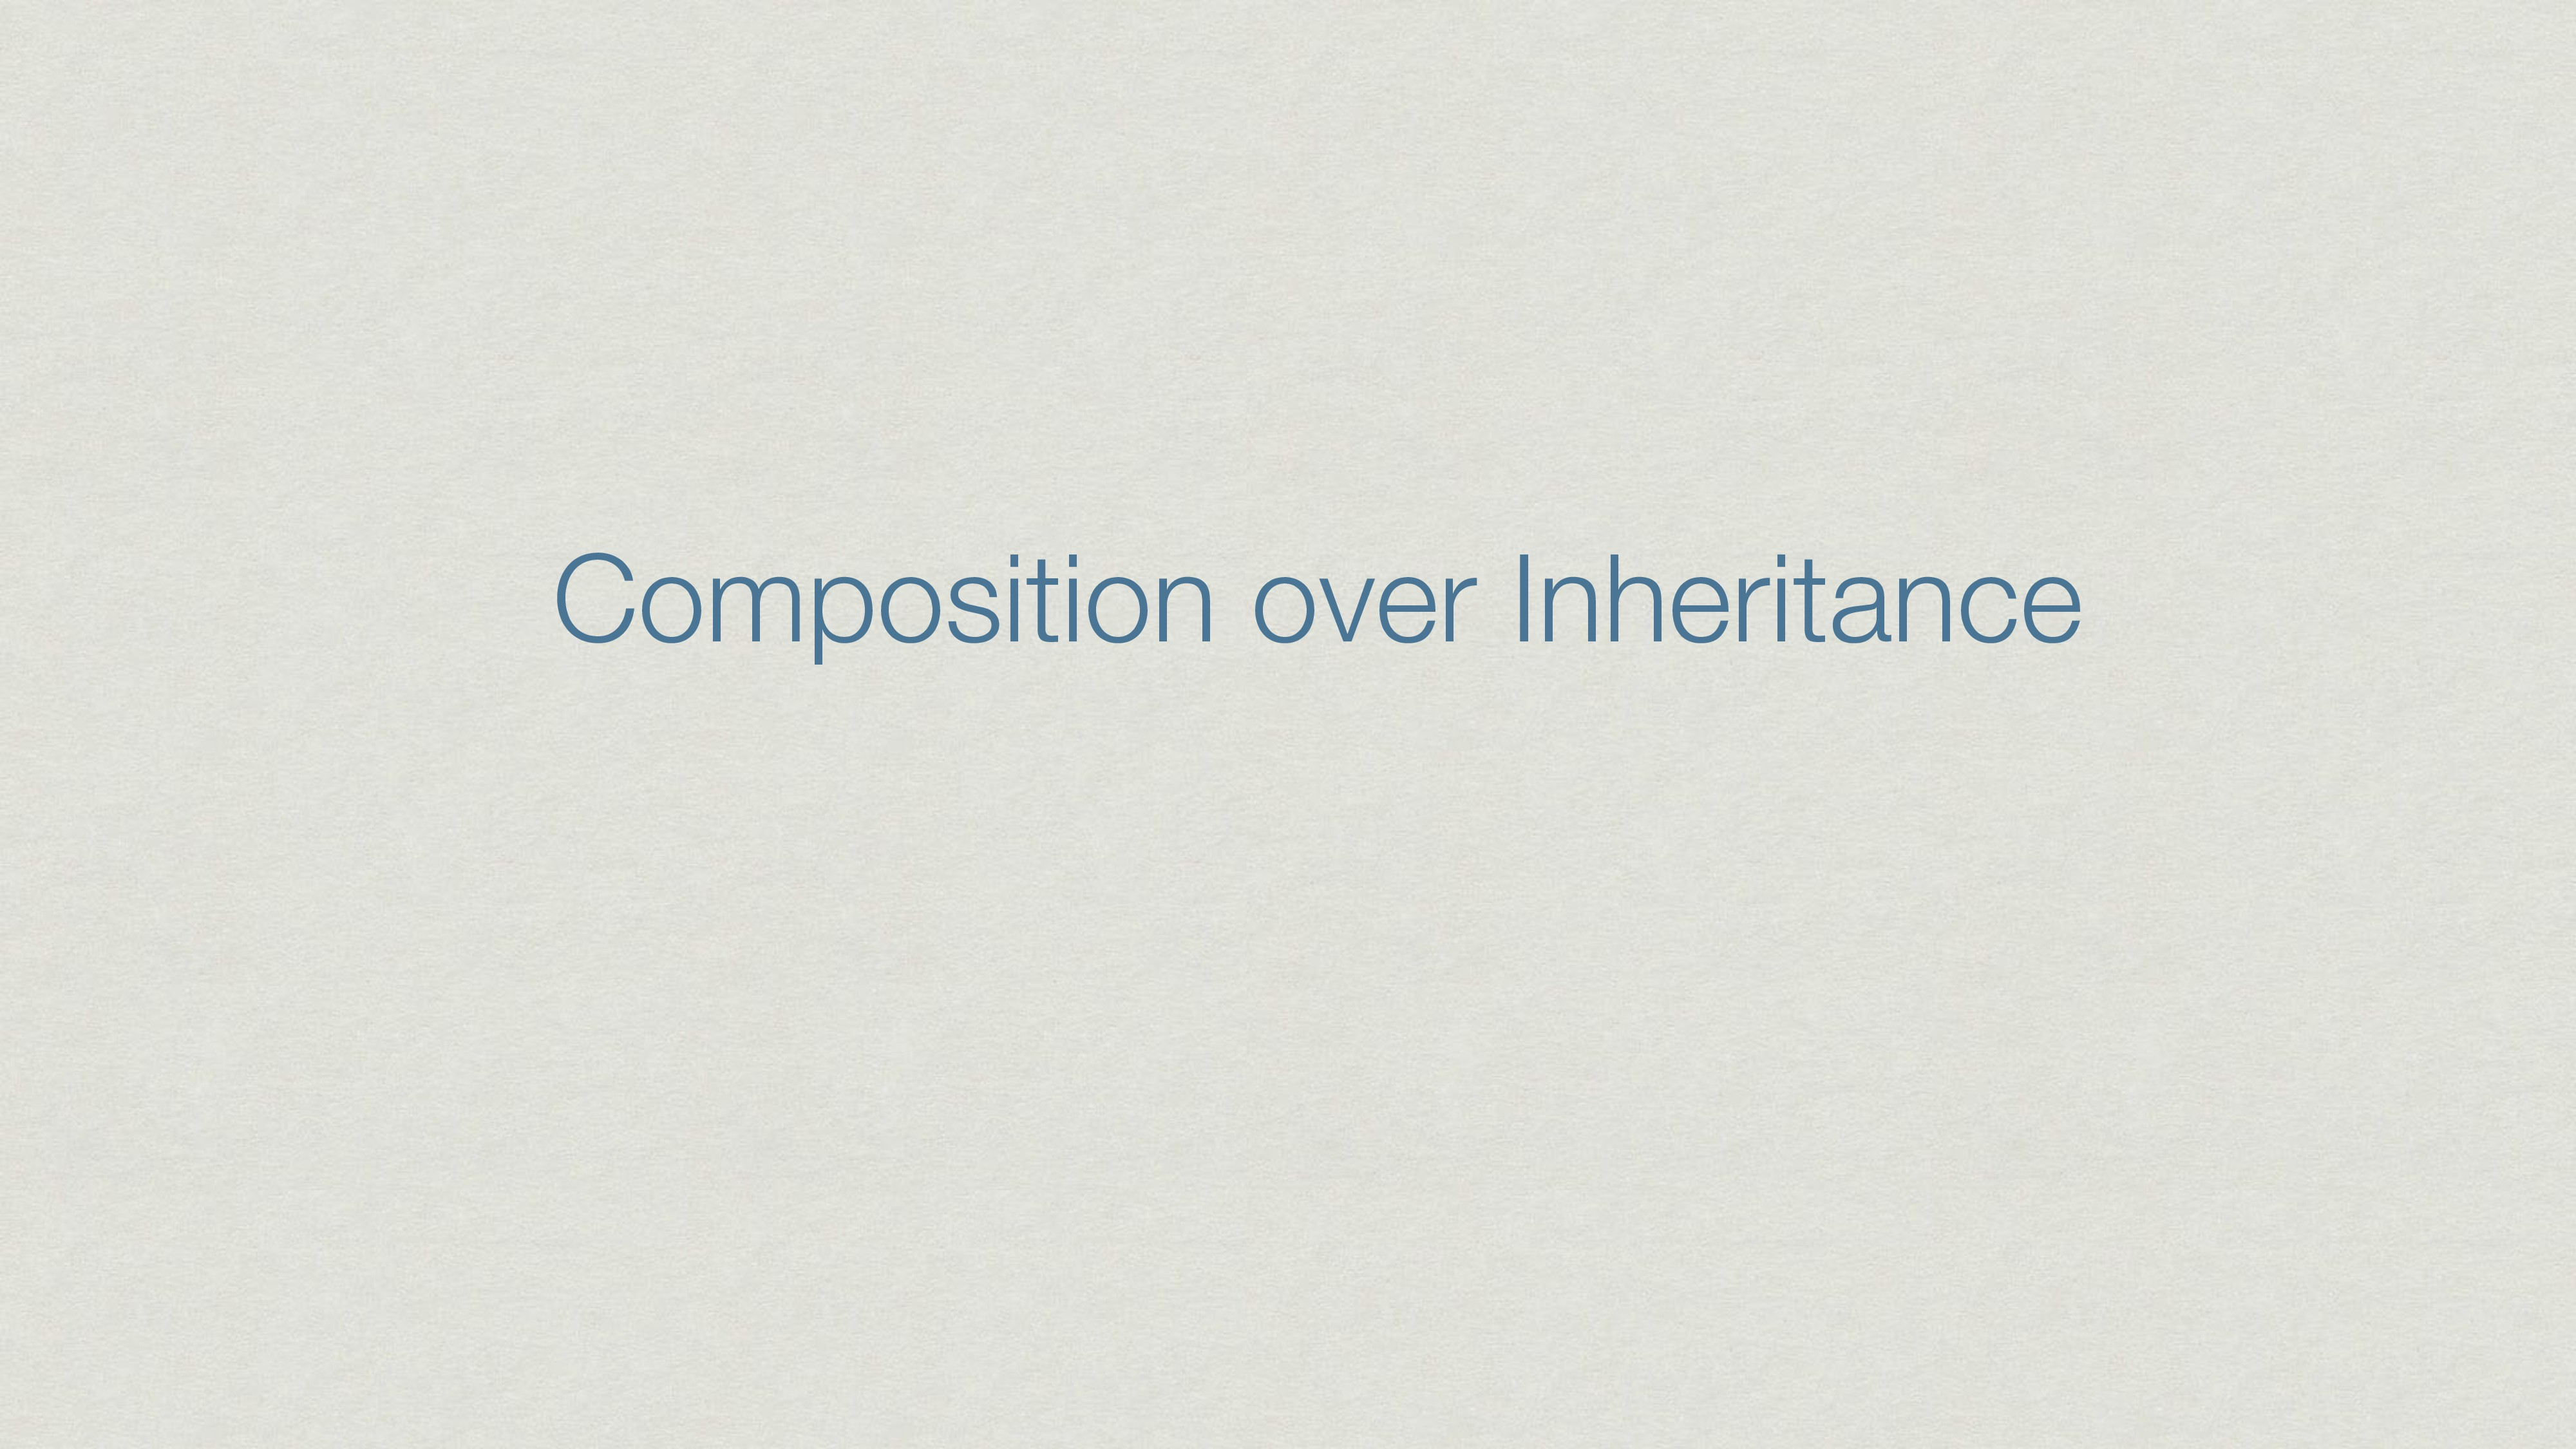 Composition over Inheritance